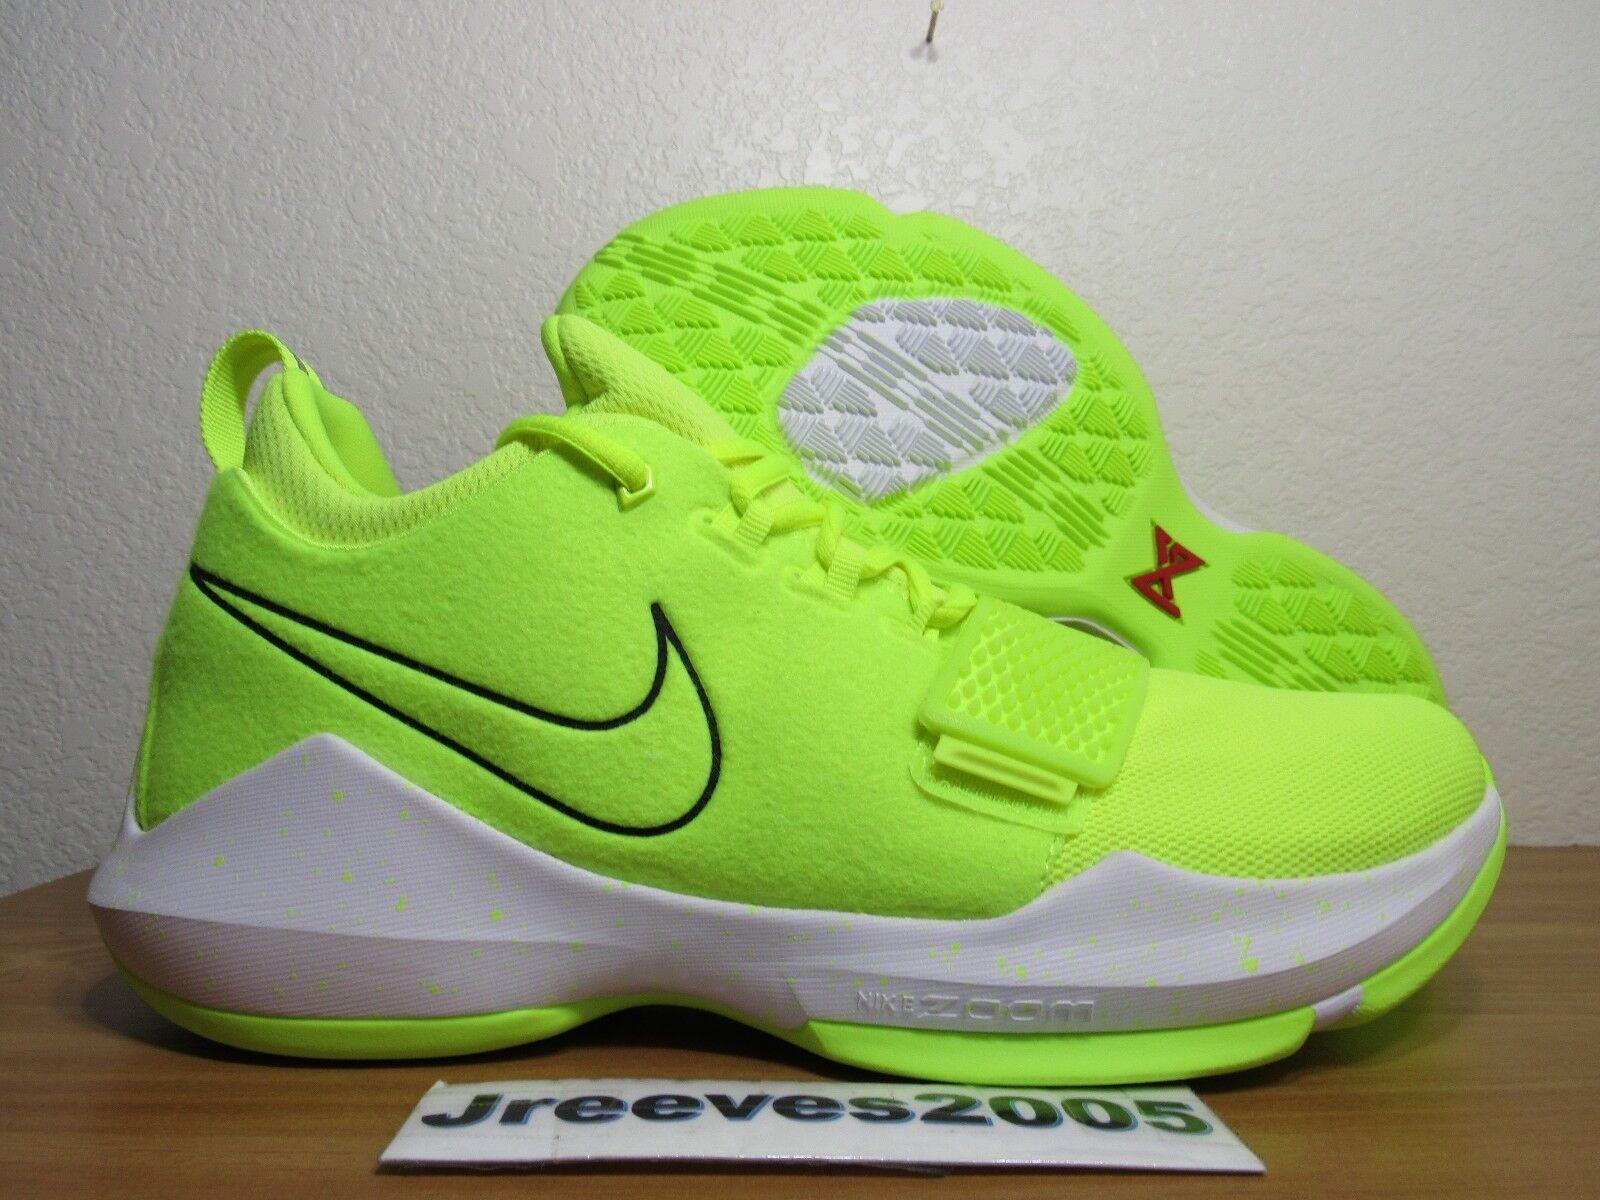 3ed7aebf3406 Men s Nike PG 1 Paul George Size 10 Volt Black White Basketball ...